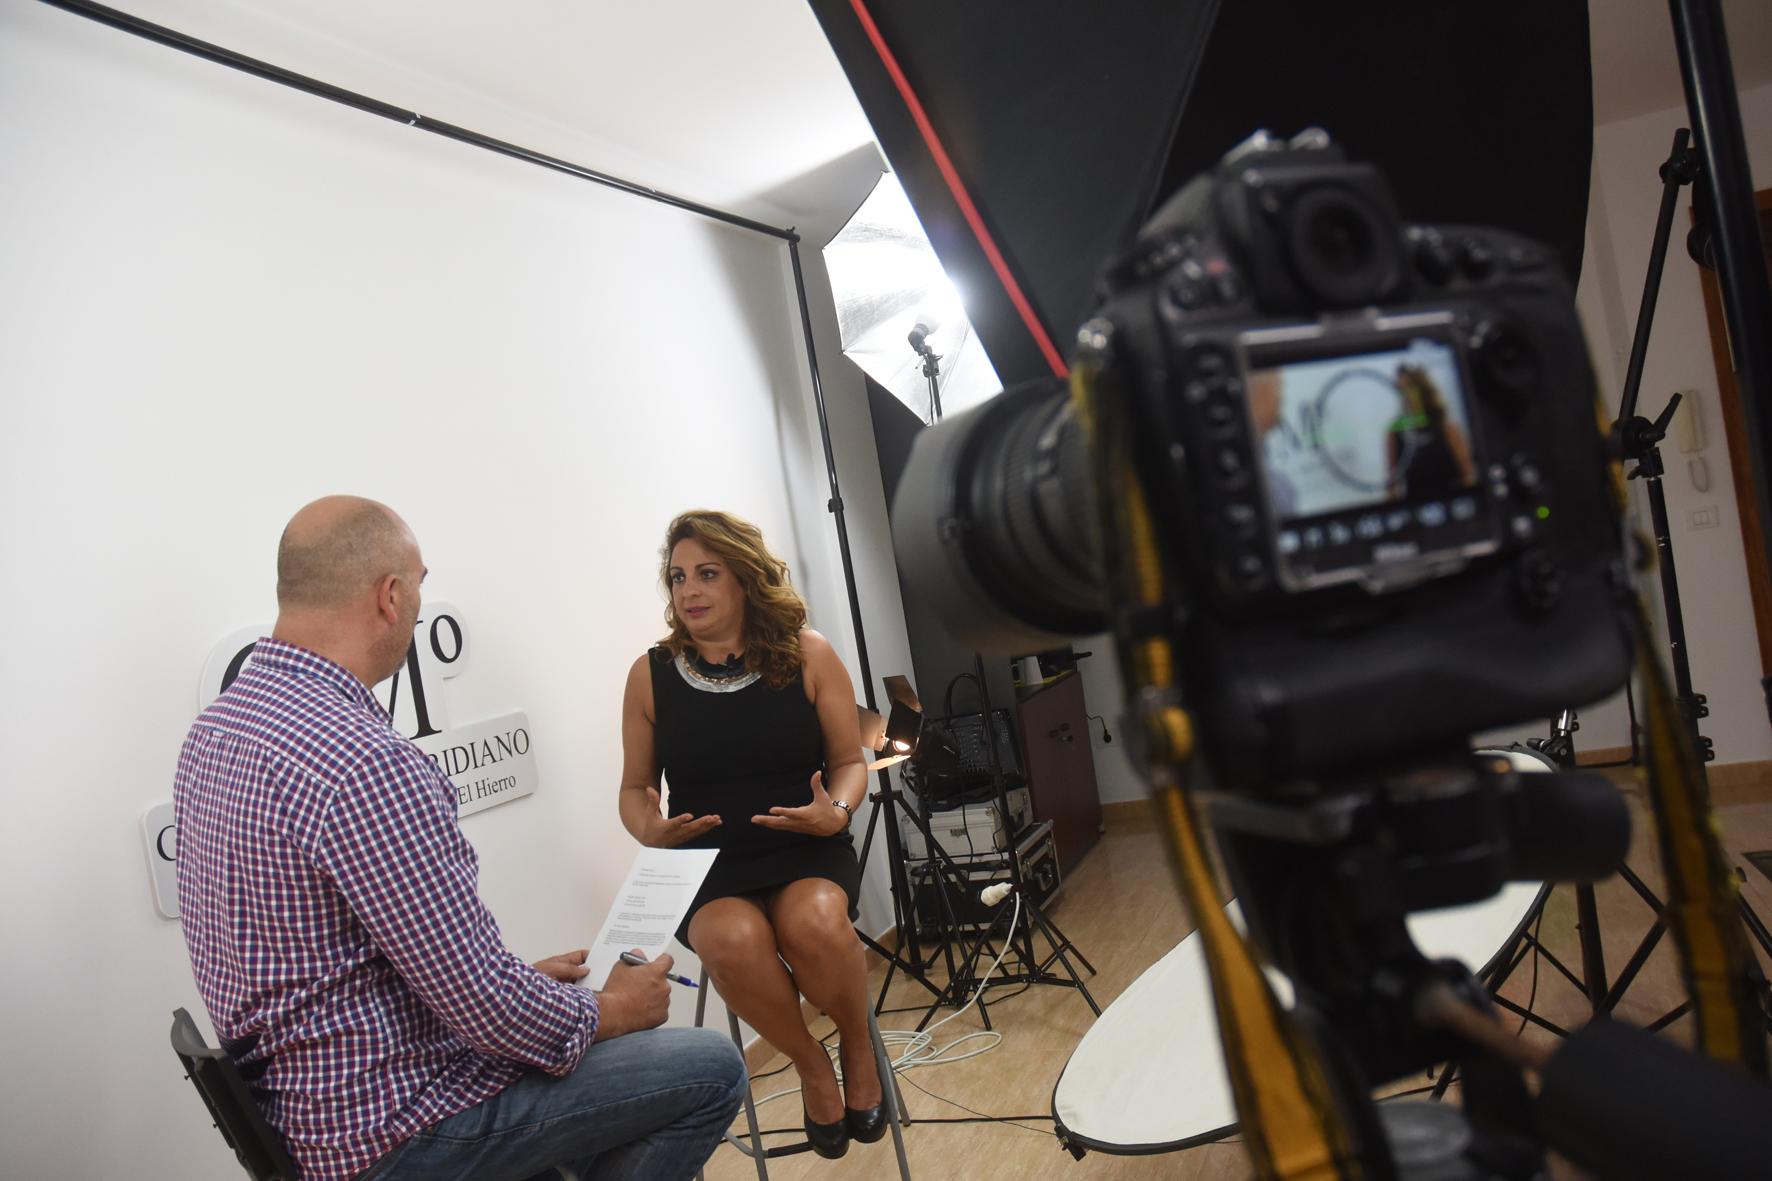 La Entrevista con Cristina Valido